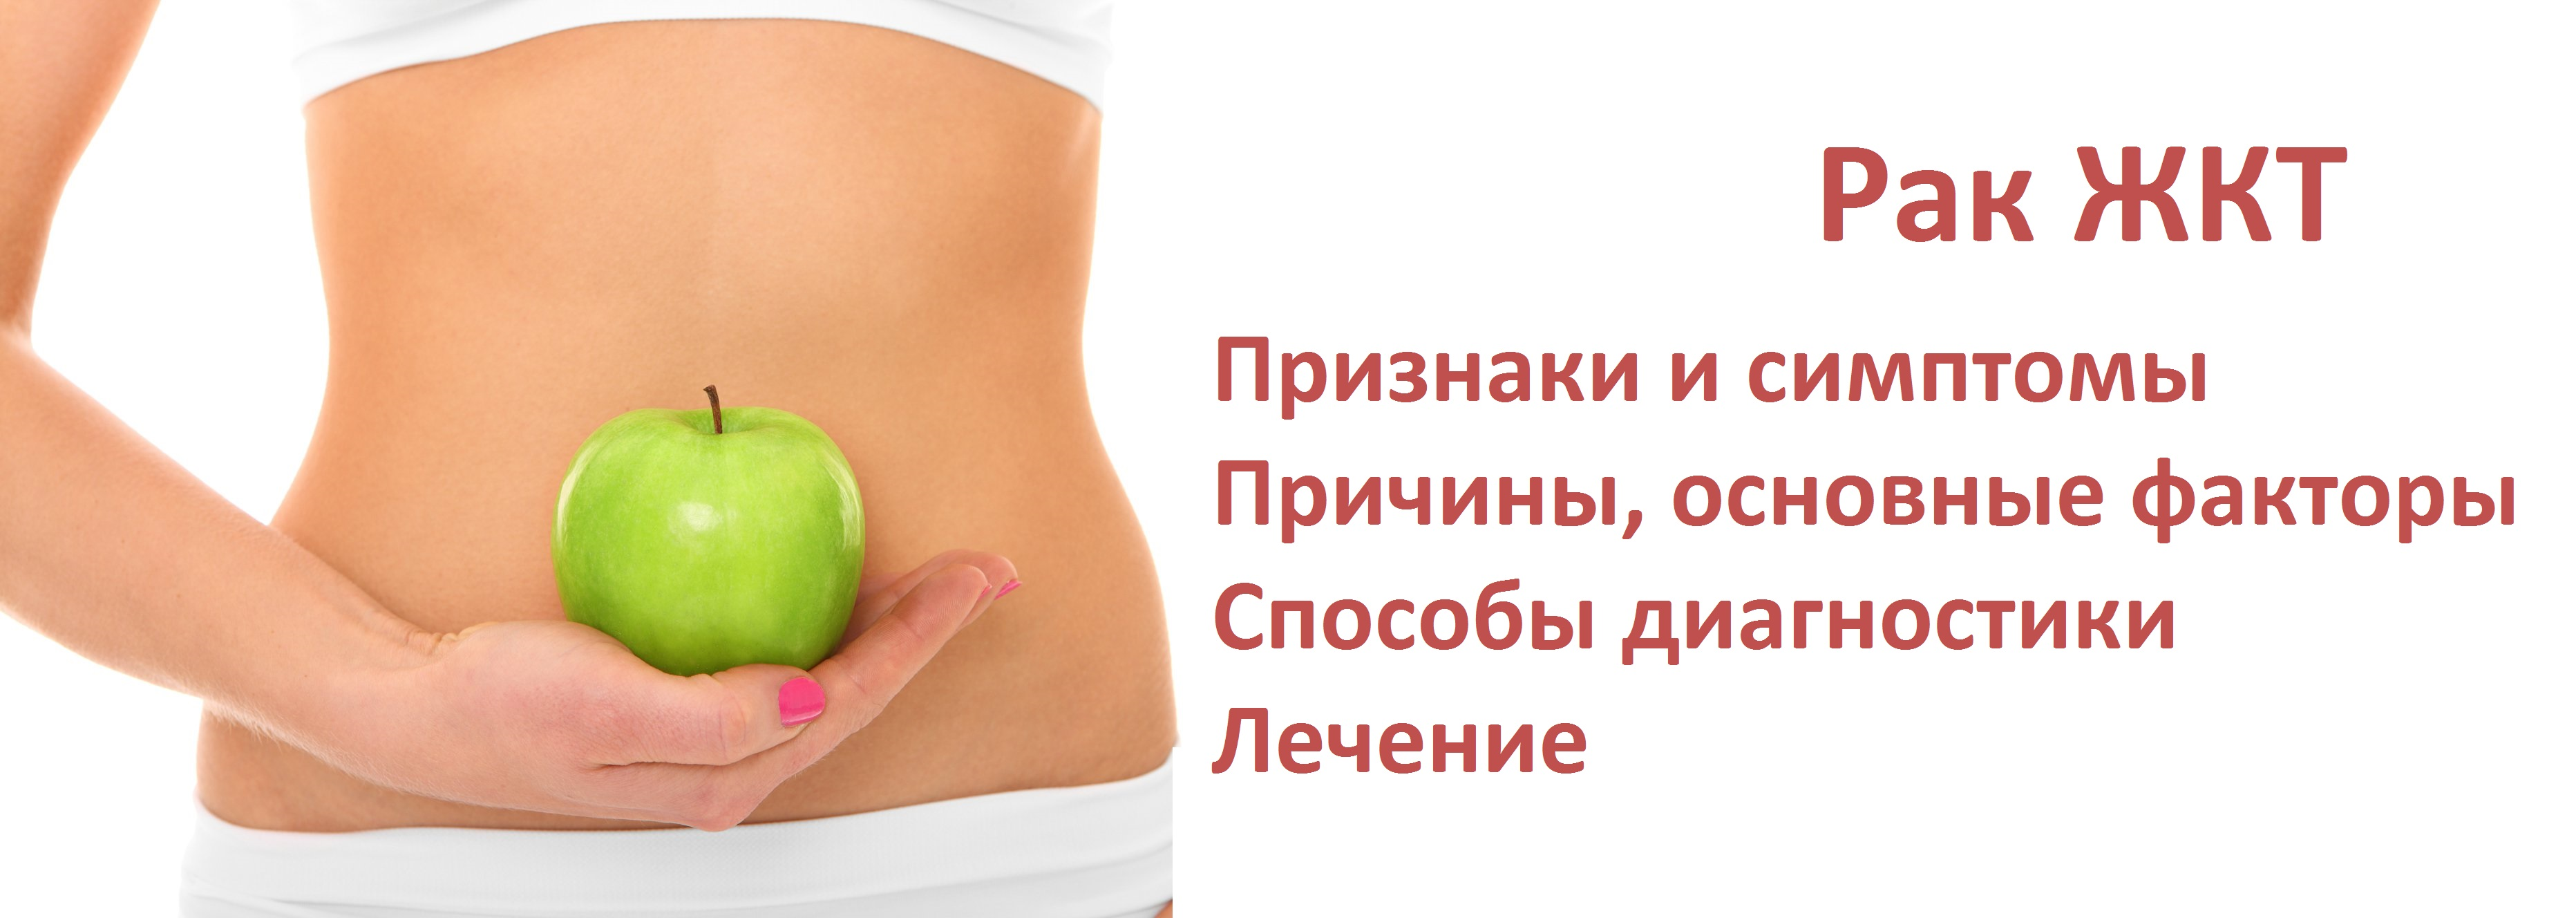 Лечение рака жкт, желудочно-кишечного тракта